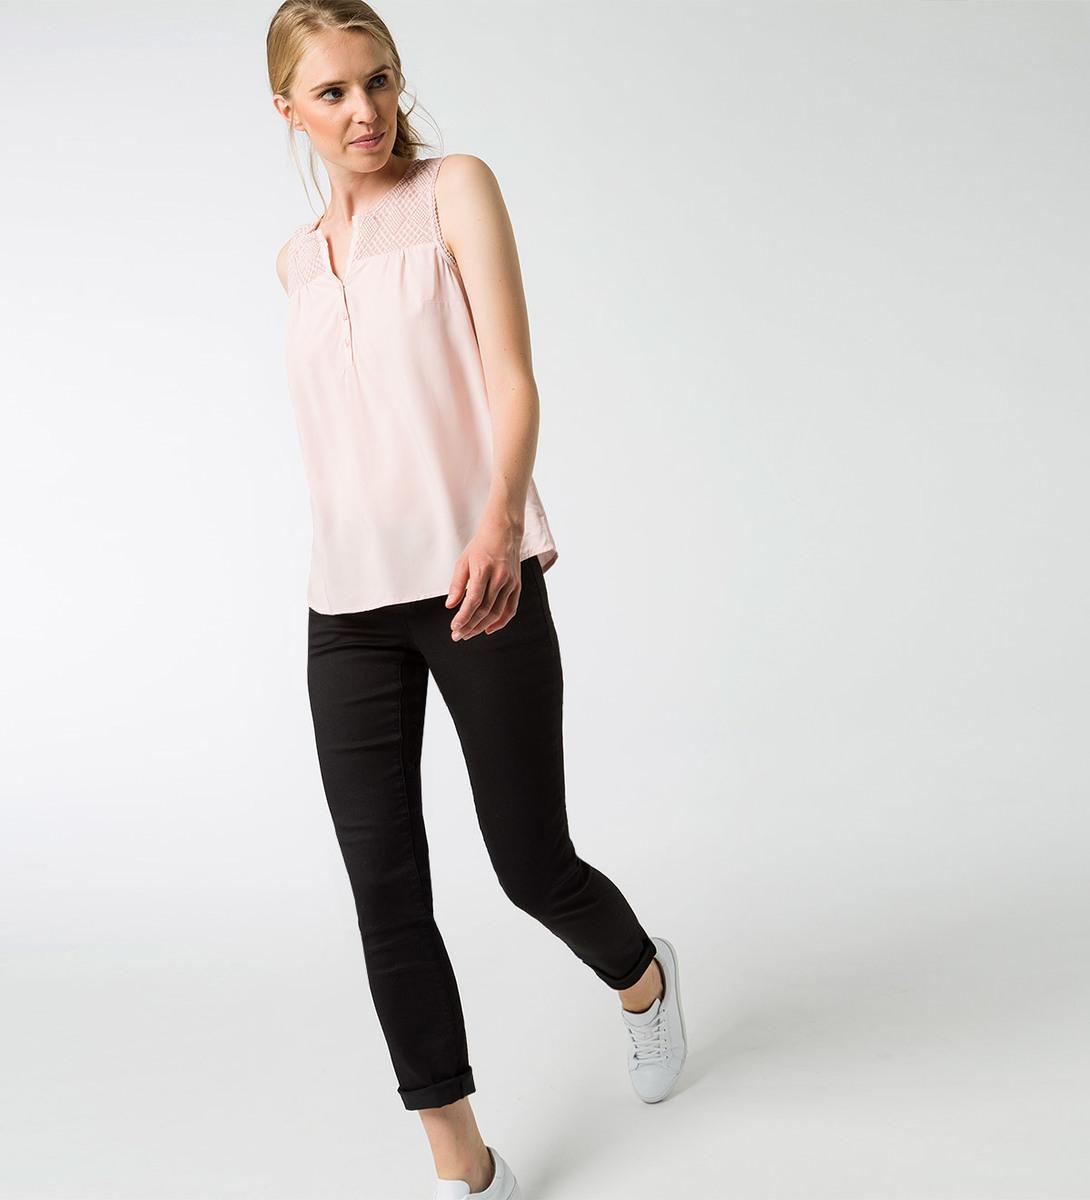 Jeans Slim fit 30 inch in black